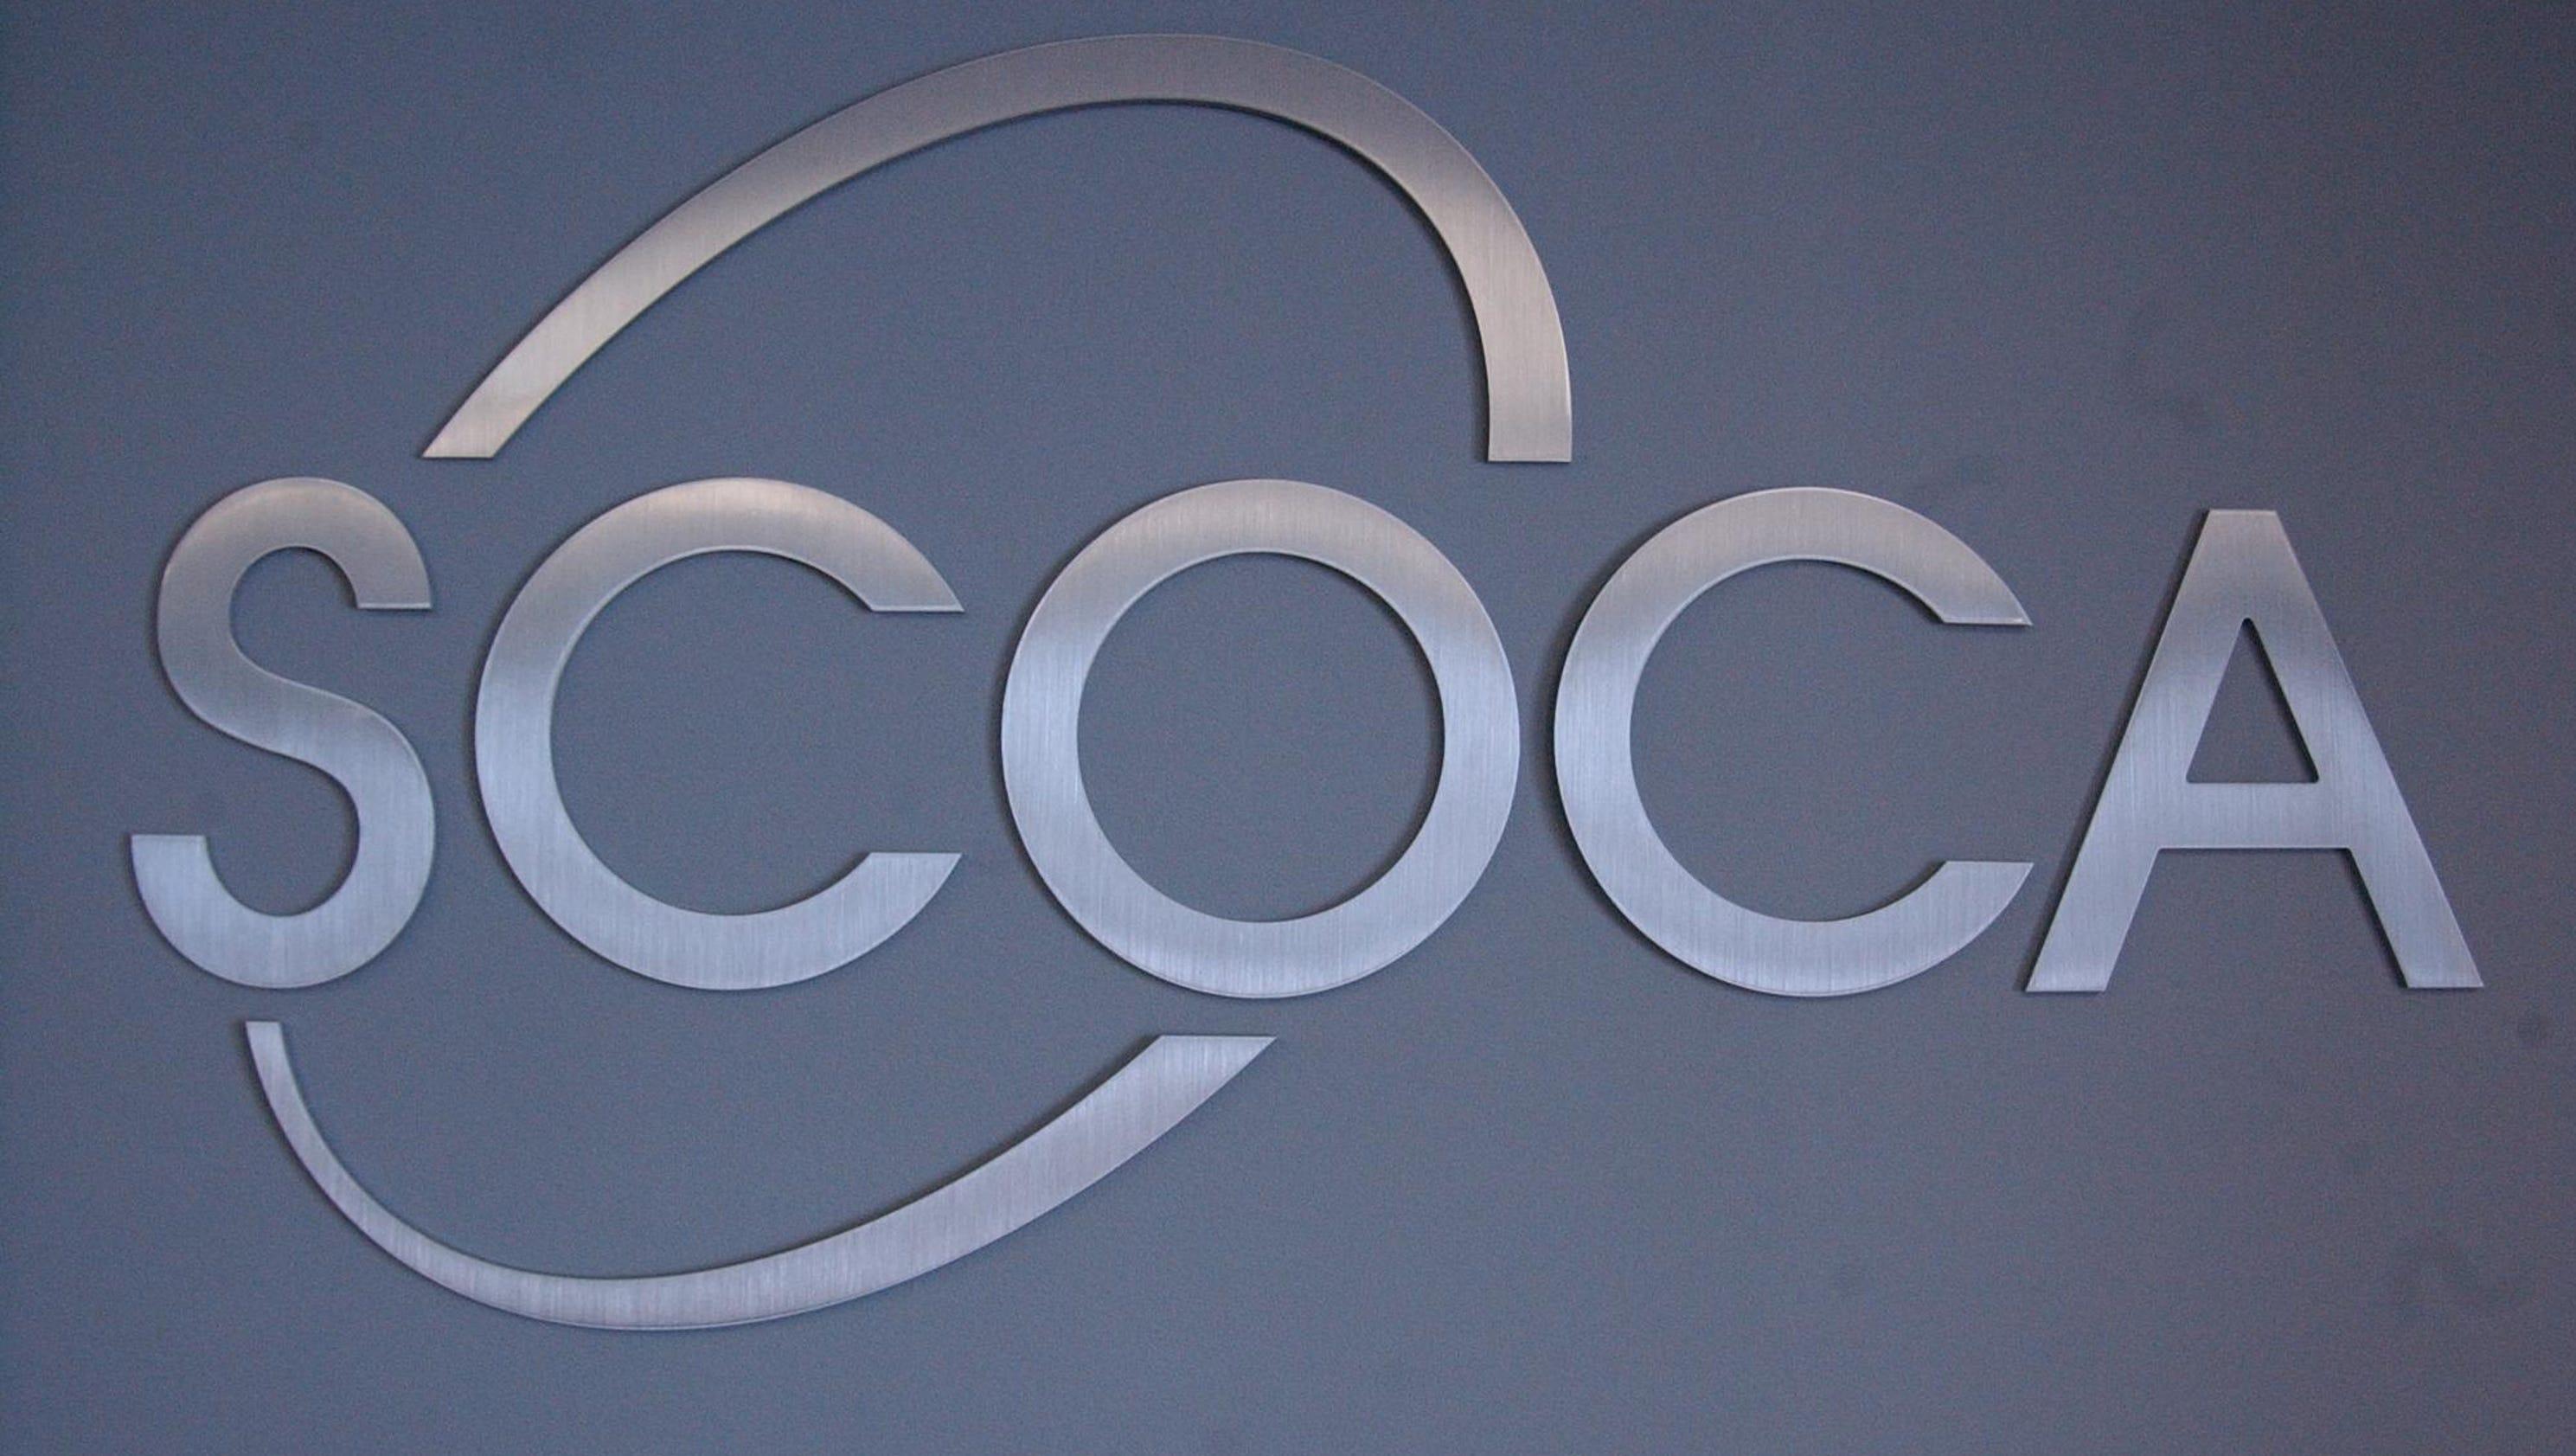 EXCLUSIVE SCOCA owes Ohio schools $1 6 million